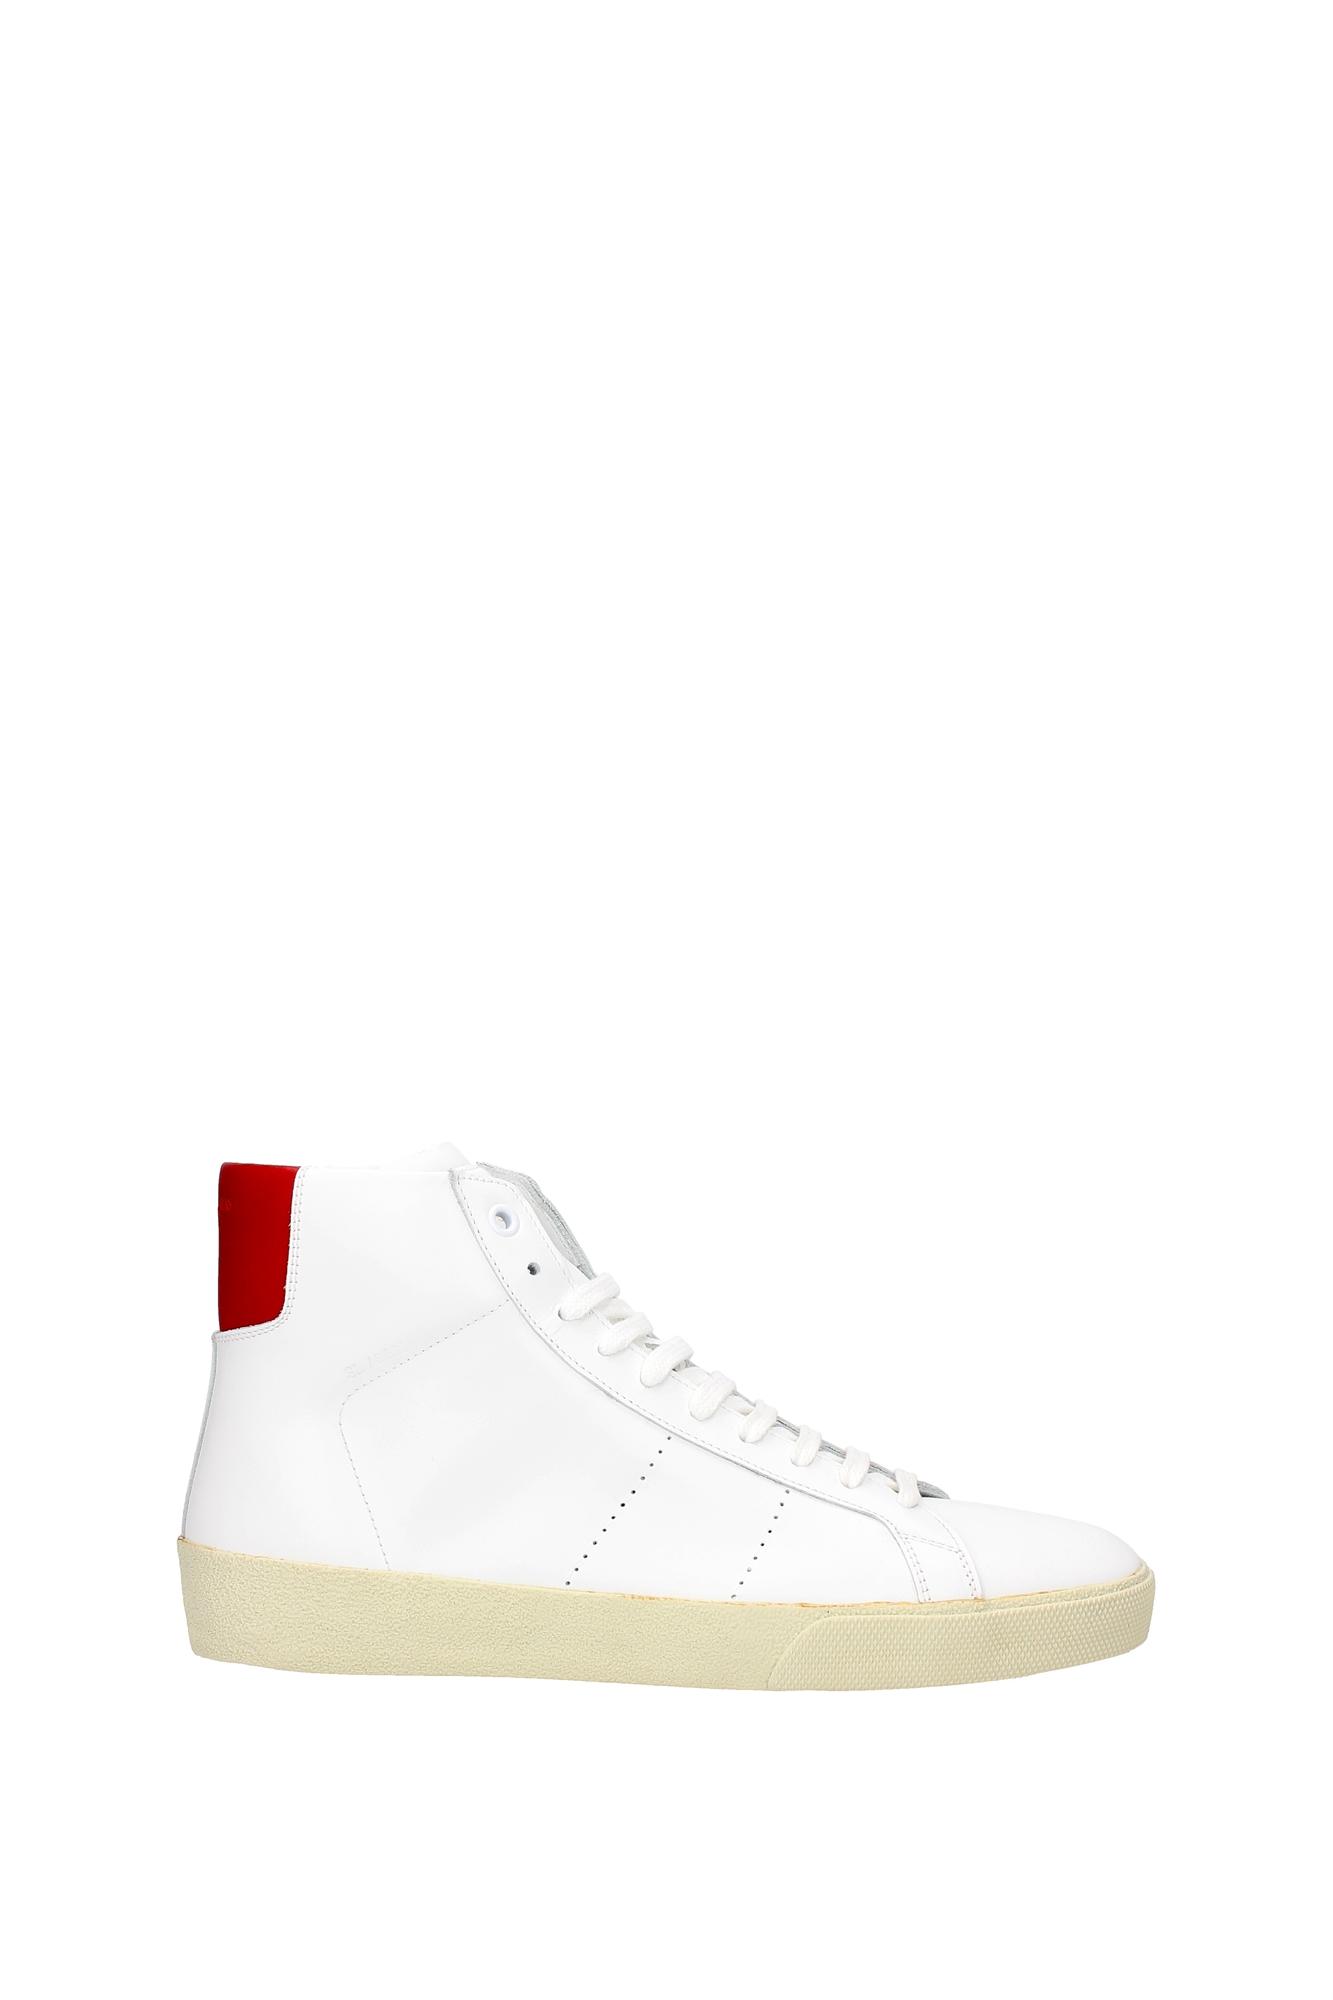 Sneakers Saint (330276AQI109062) Laurent Herren - Leder (330276AQI109062) Saint 35a42f